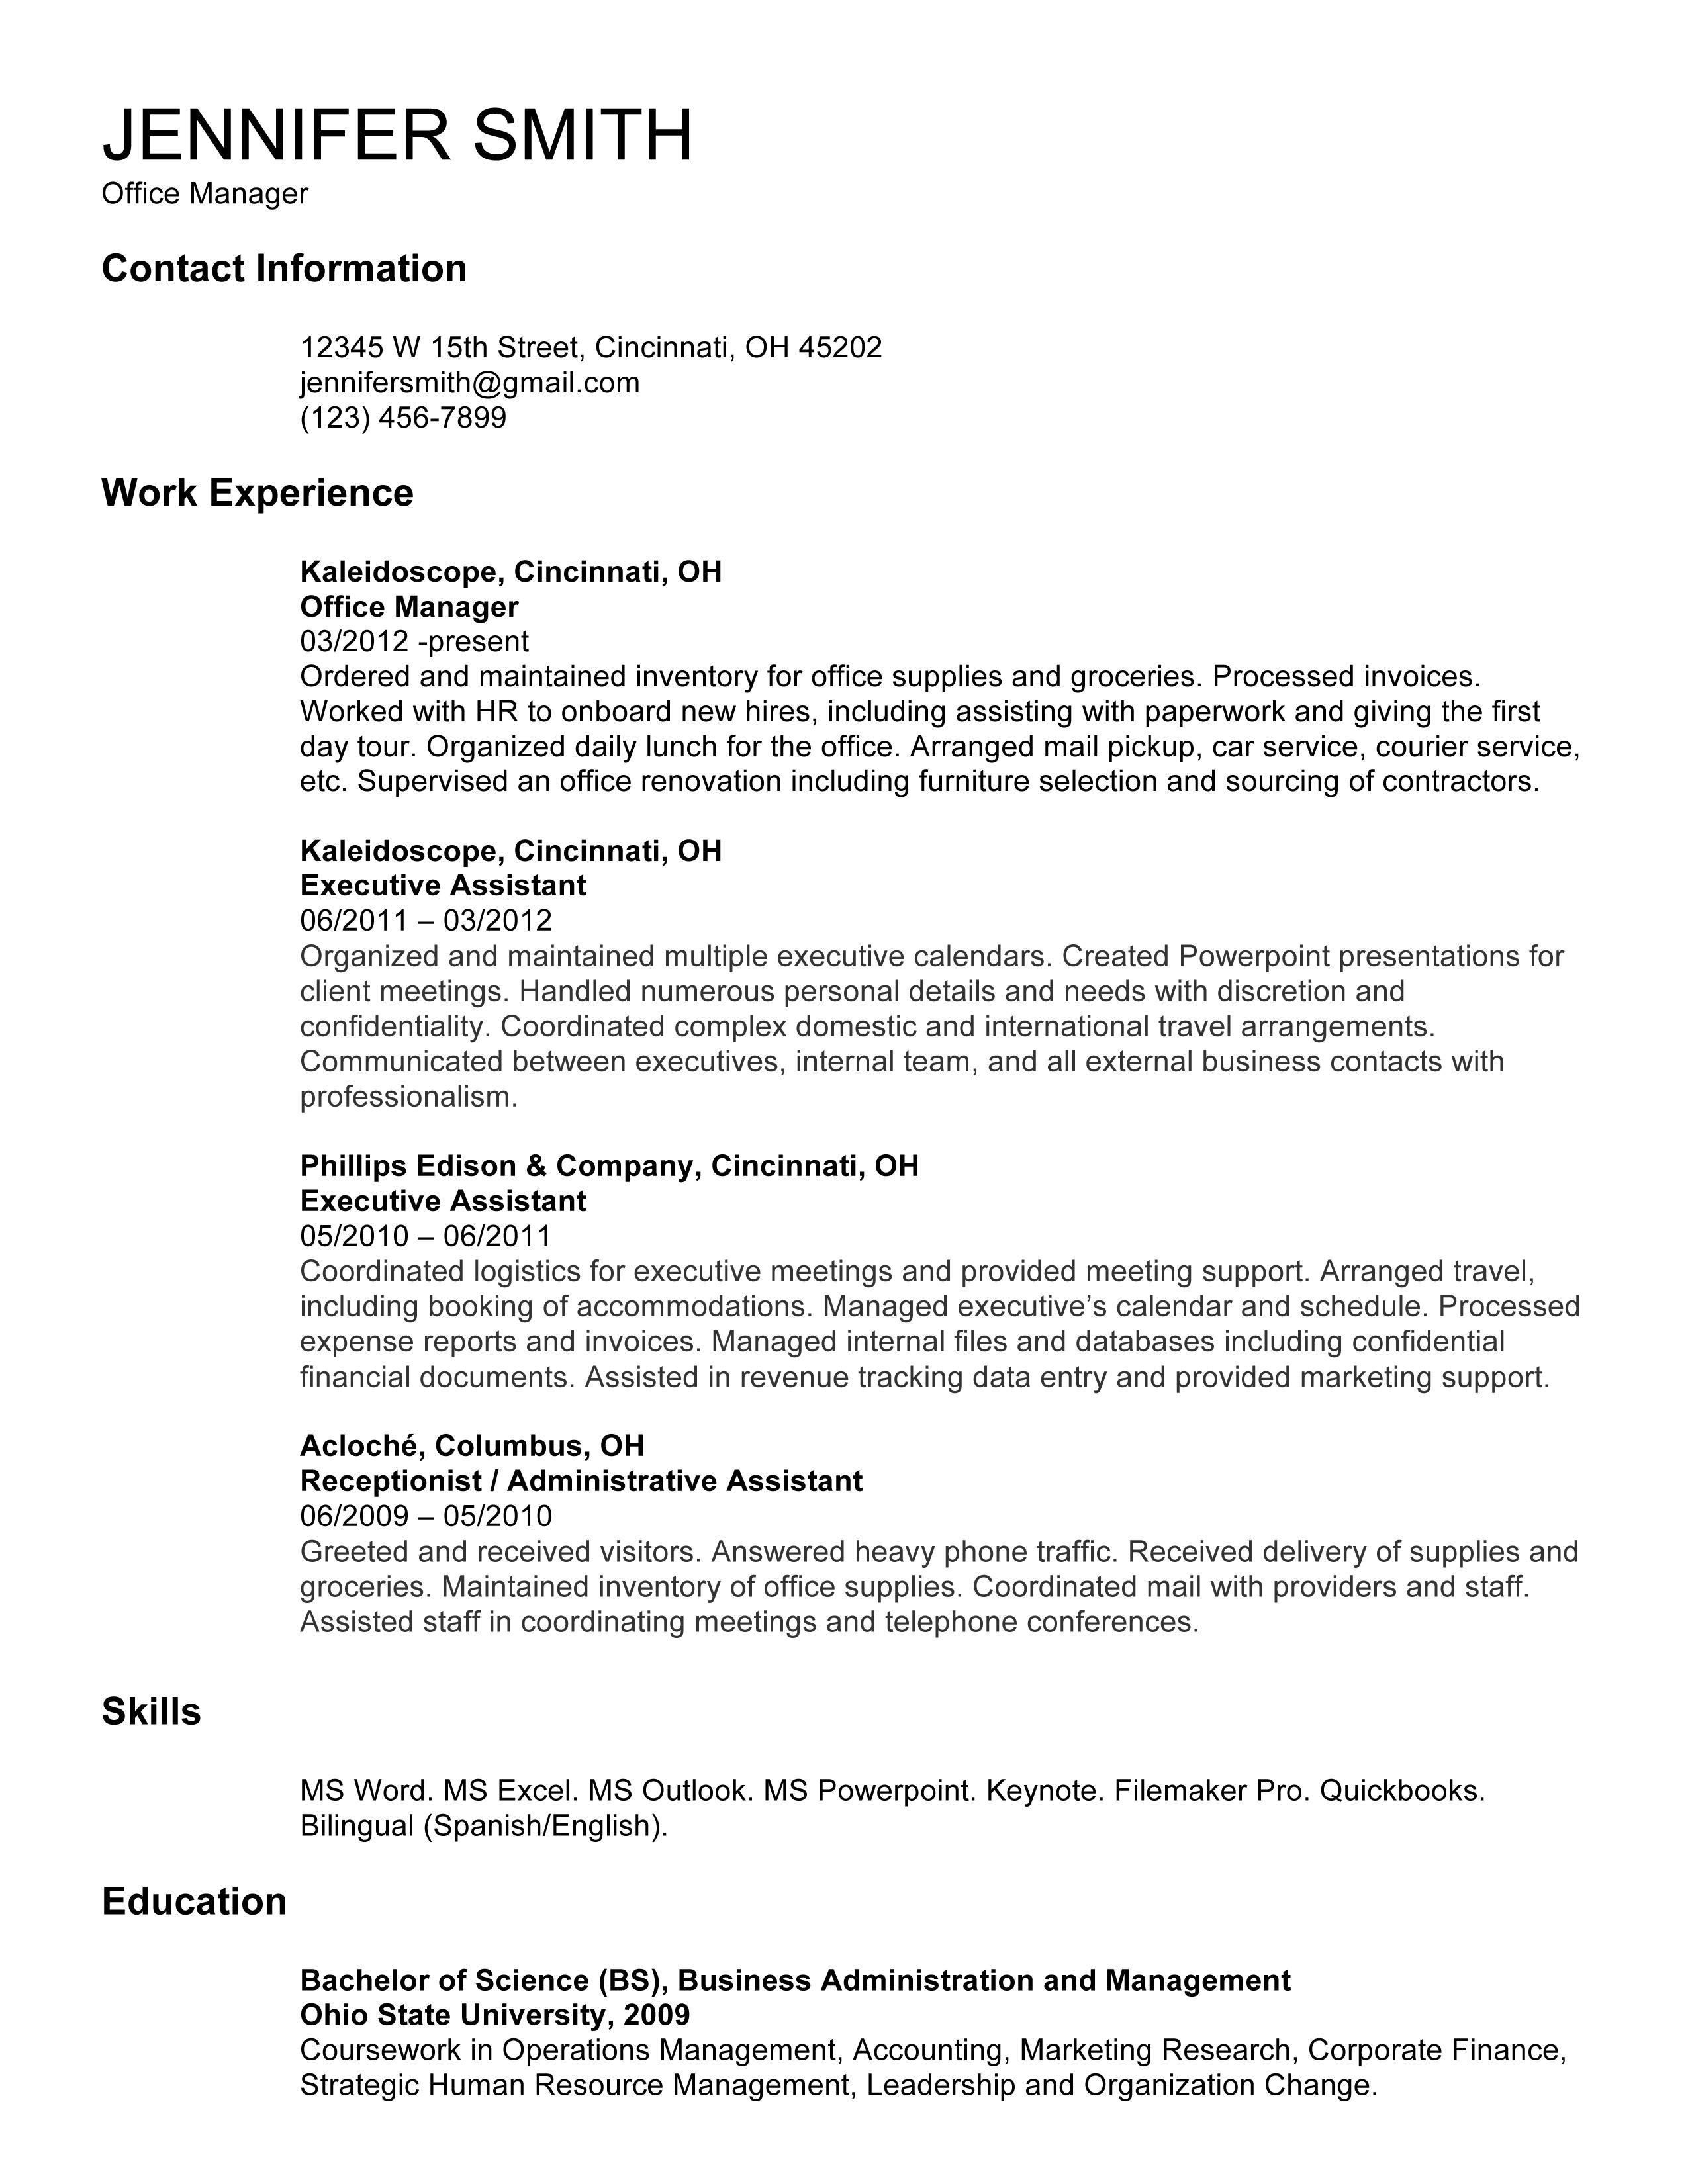 great resume template - solarfm.tk